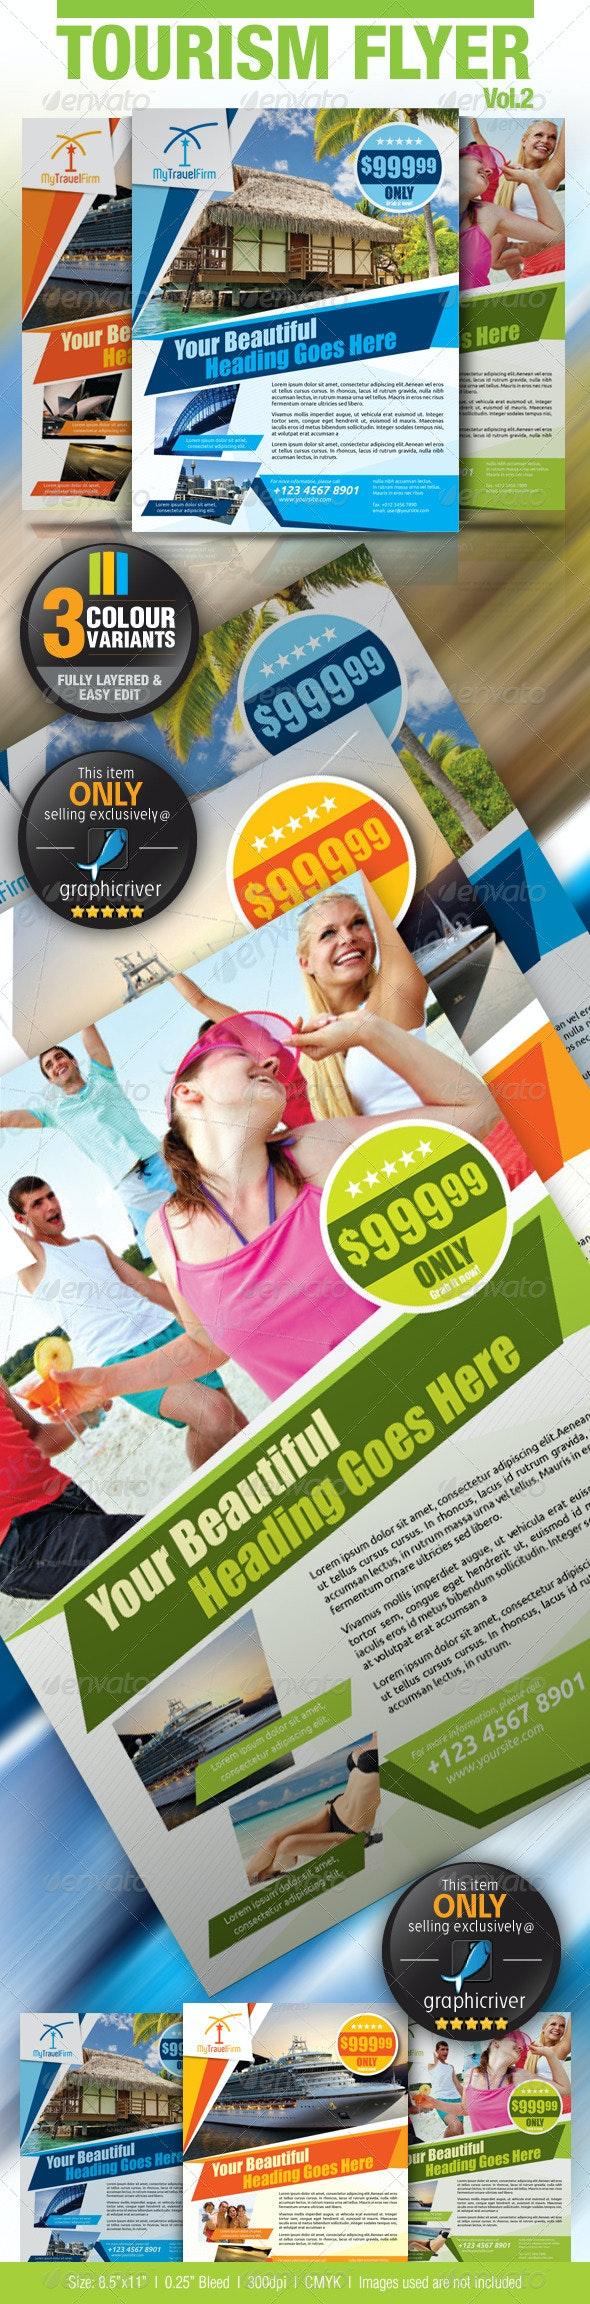 Tourism Flyer Vol.2 - Holidays Events